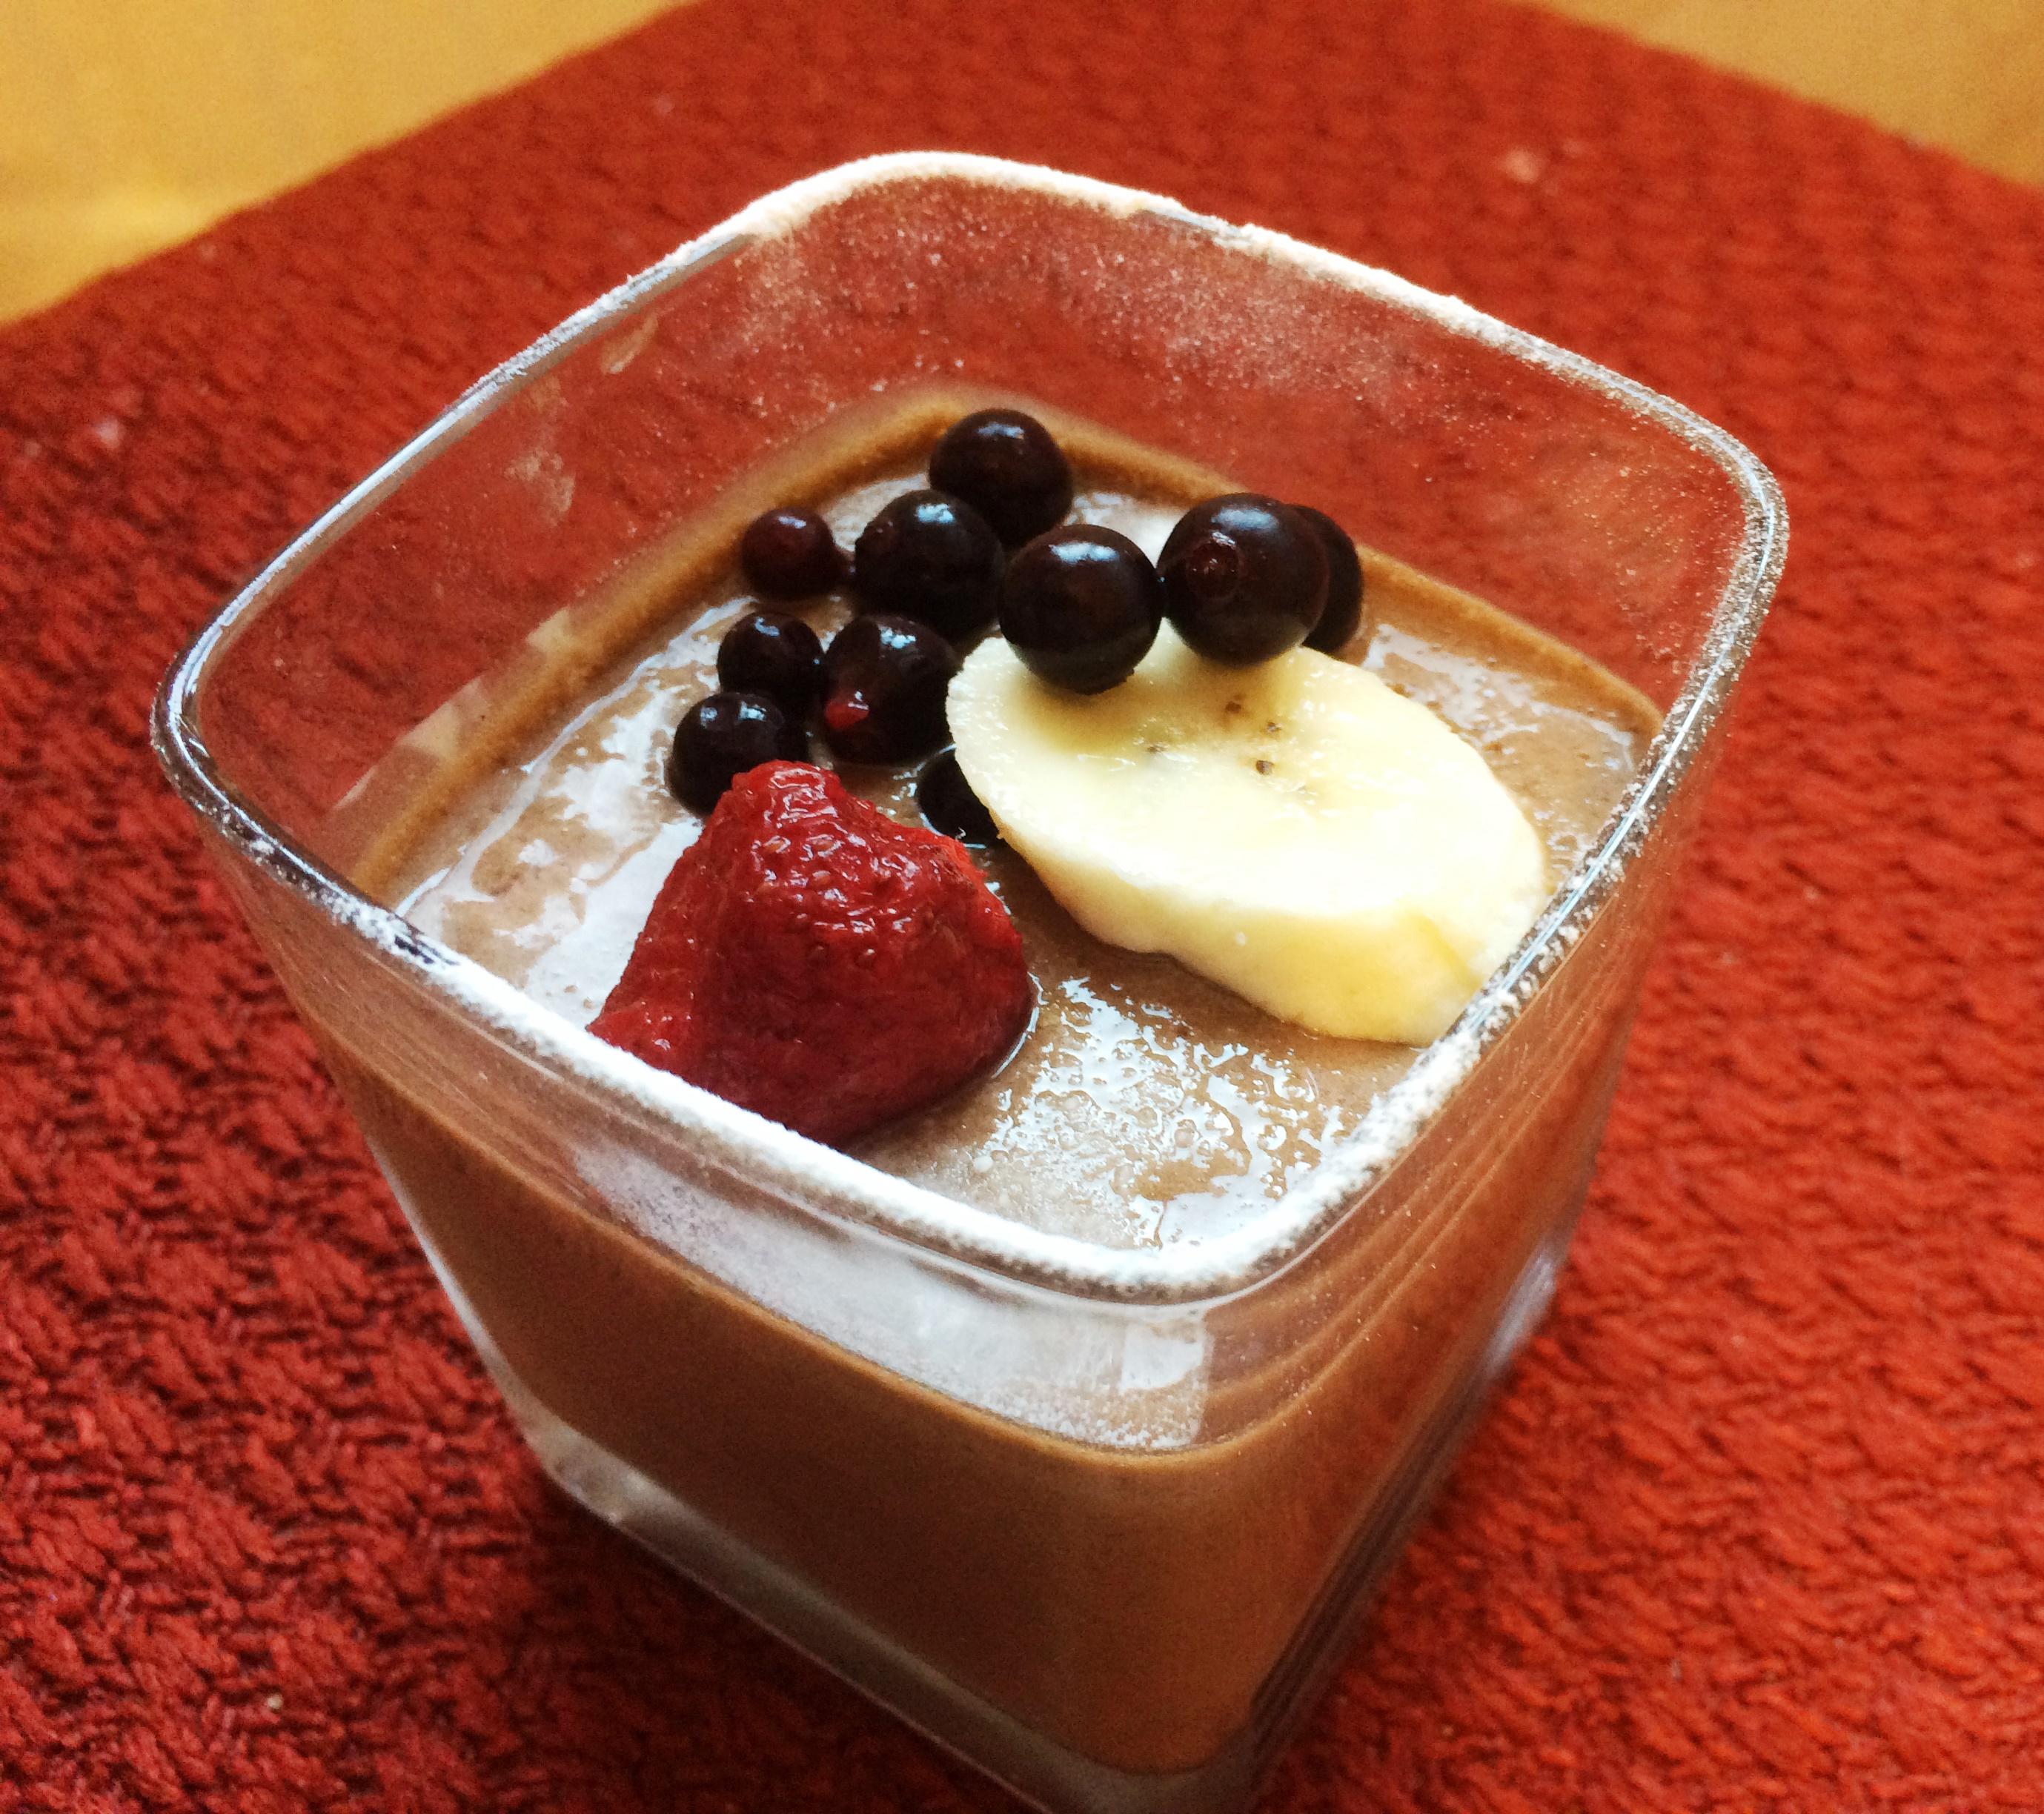 Creamiest Chocolate Mousse image